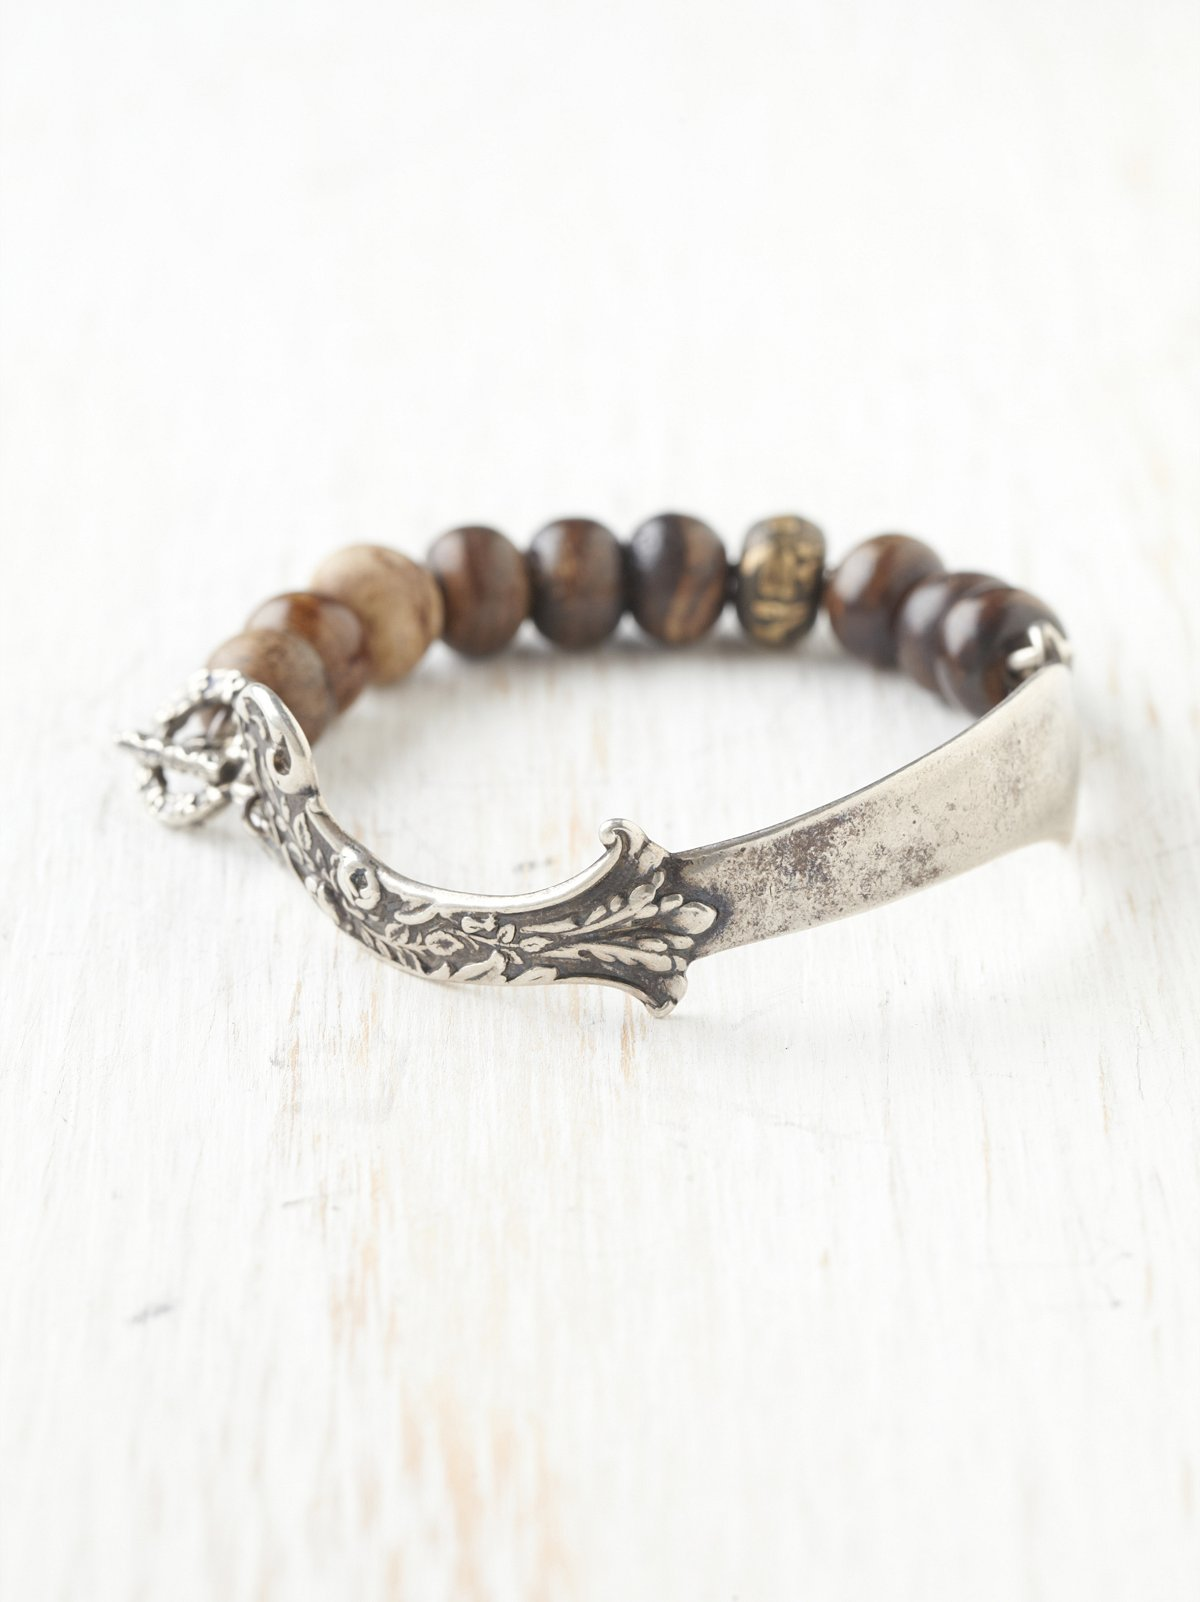 Balthazar Scroll Bracelet